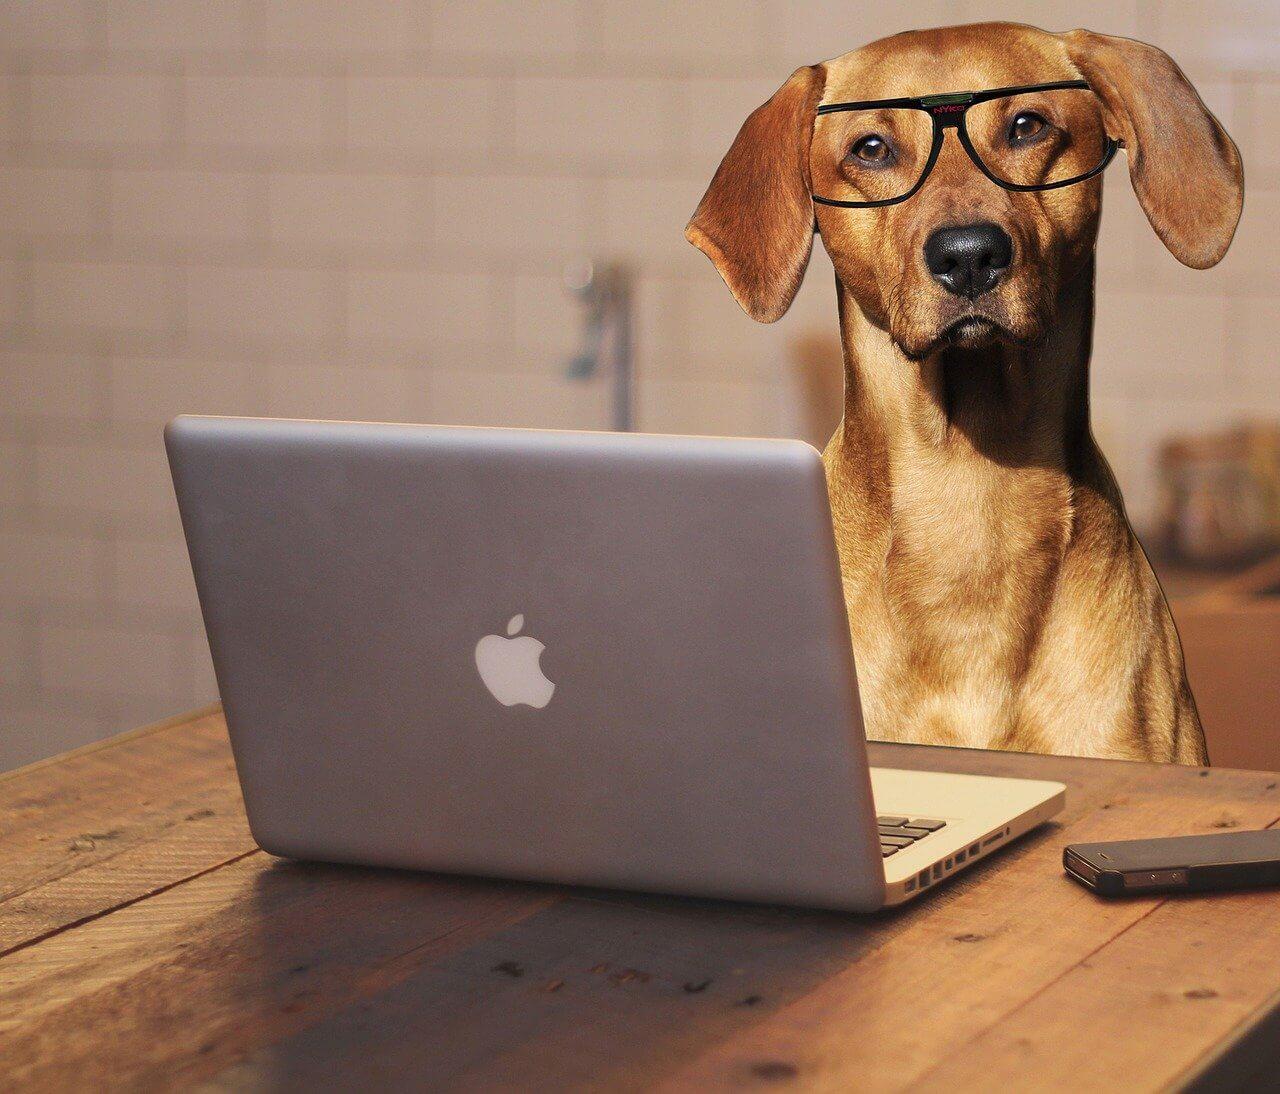 dog wearing glasses working on macbook